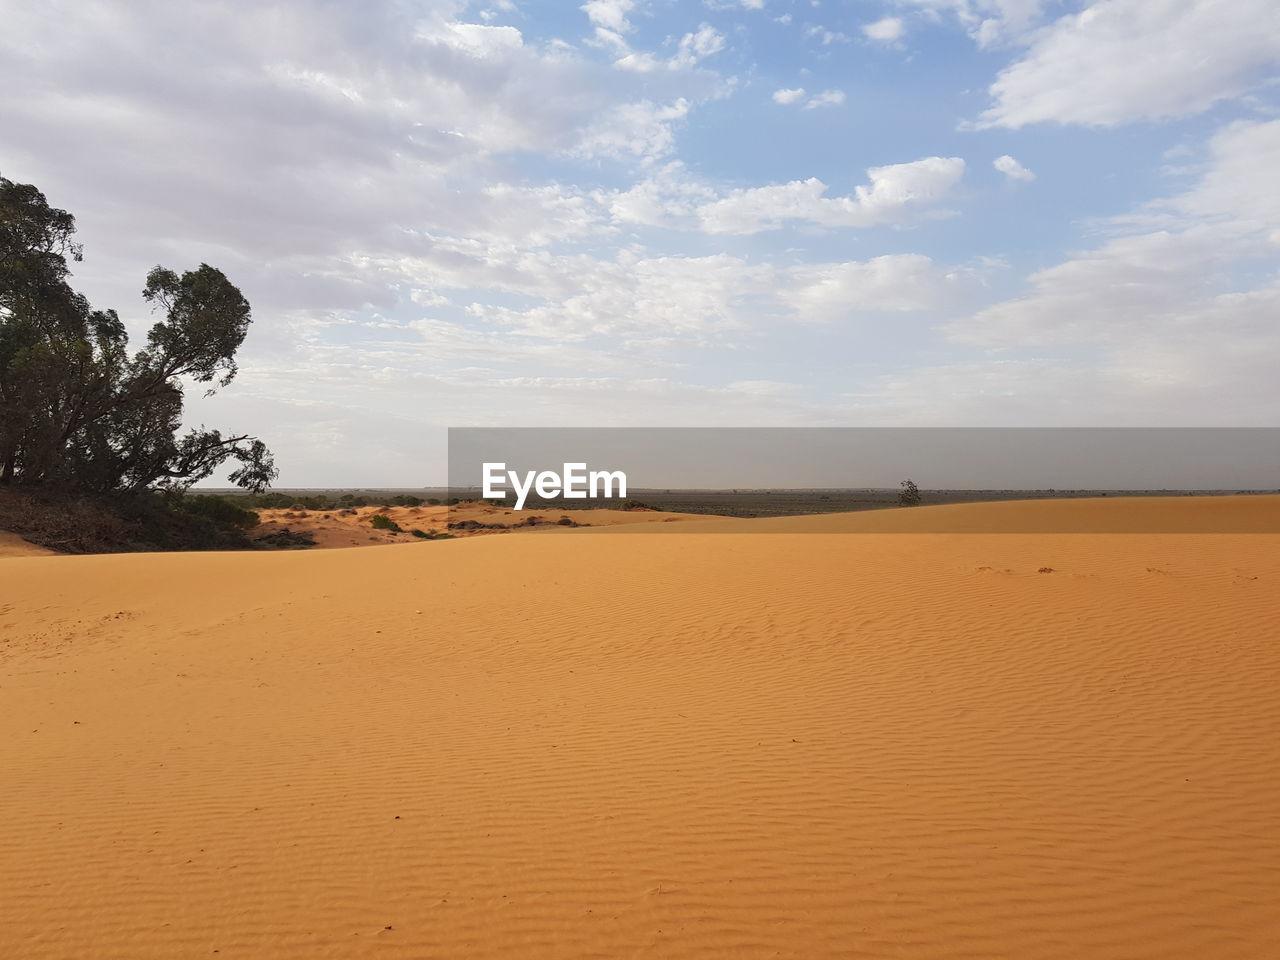 sky, cloud - sky, land, sand, scenics - nature, tranquility, tranquil scene, beauty in nature, nature, landscape, environment, desert, no people, non-urban scene, climate, arid climate, day, tree, plant, horizon, outdoors